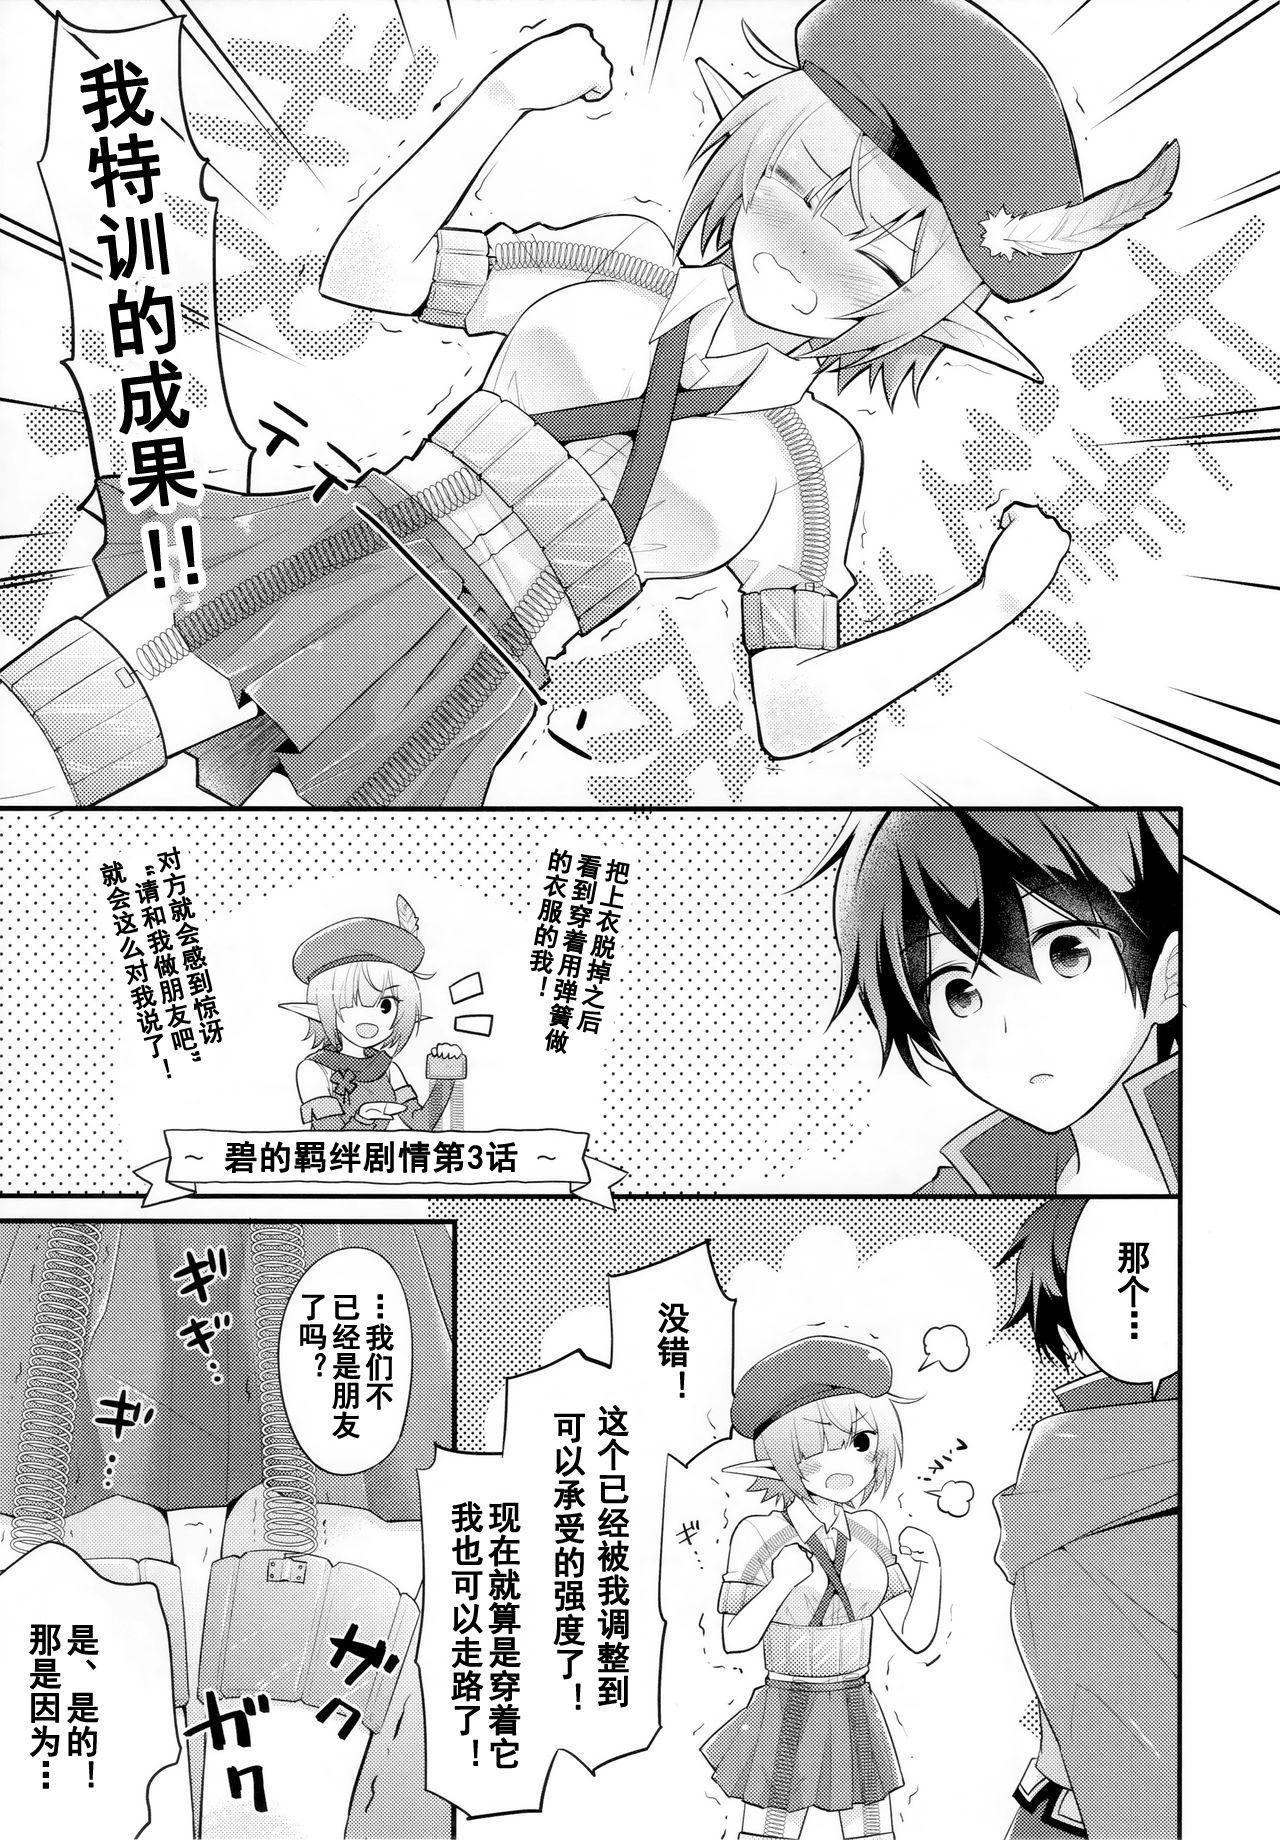 Aoi no Motto Otomodachi Daisakusen 10